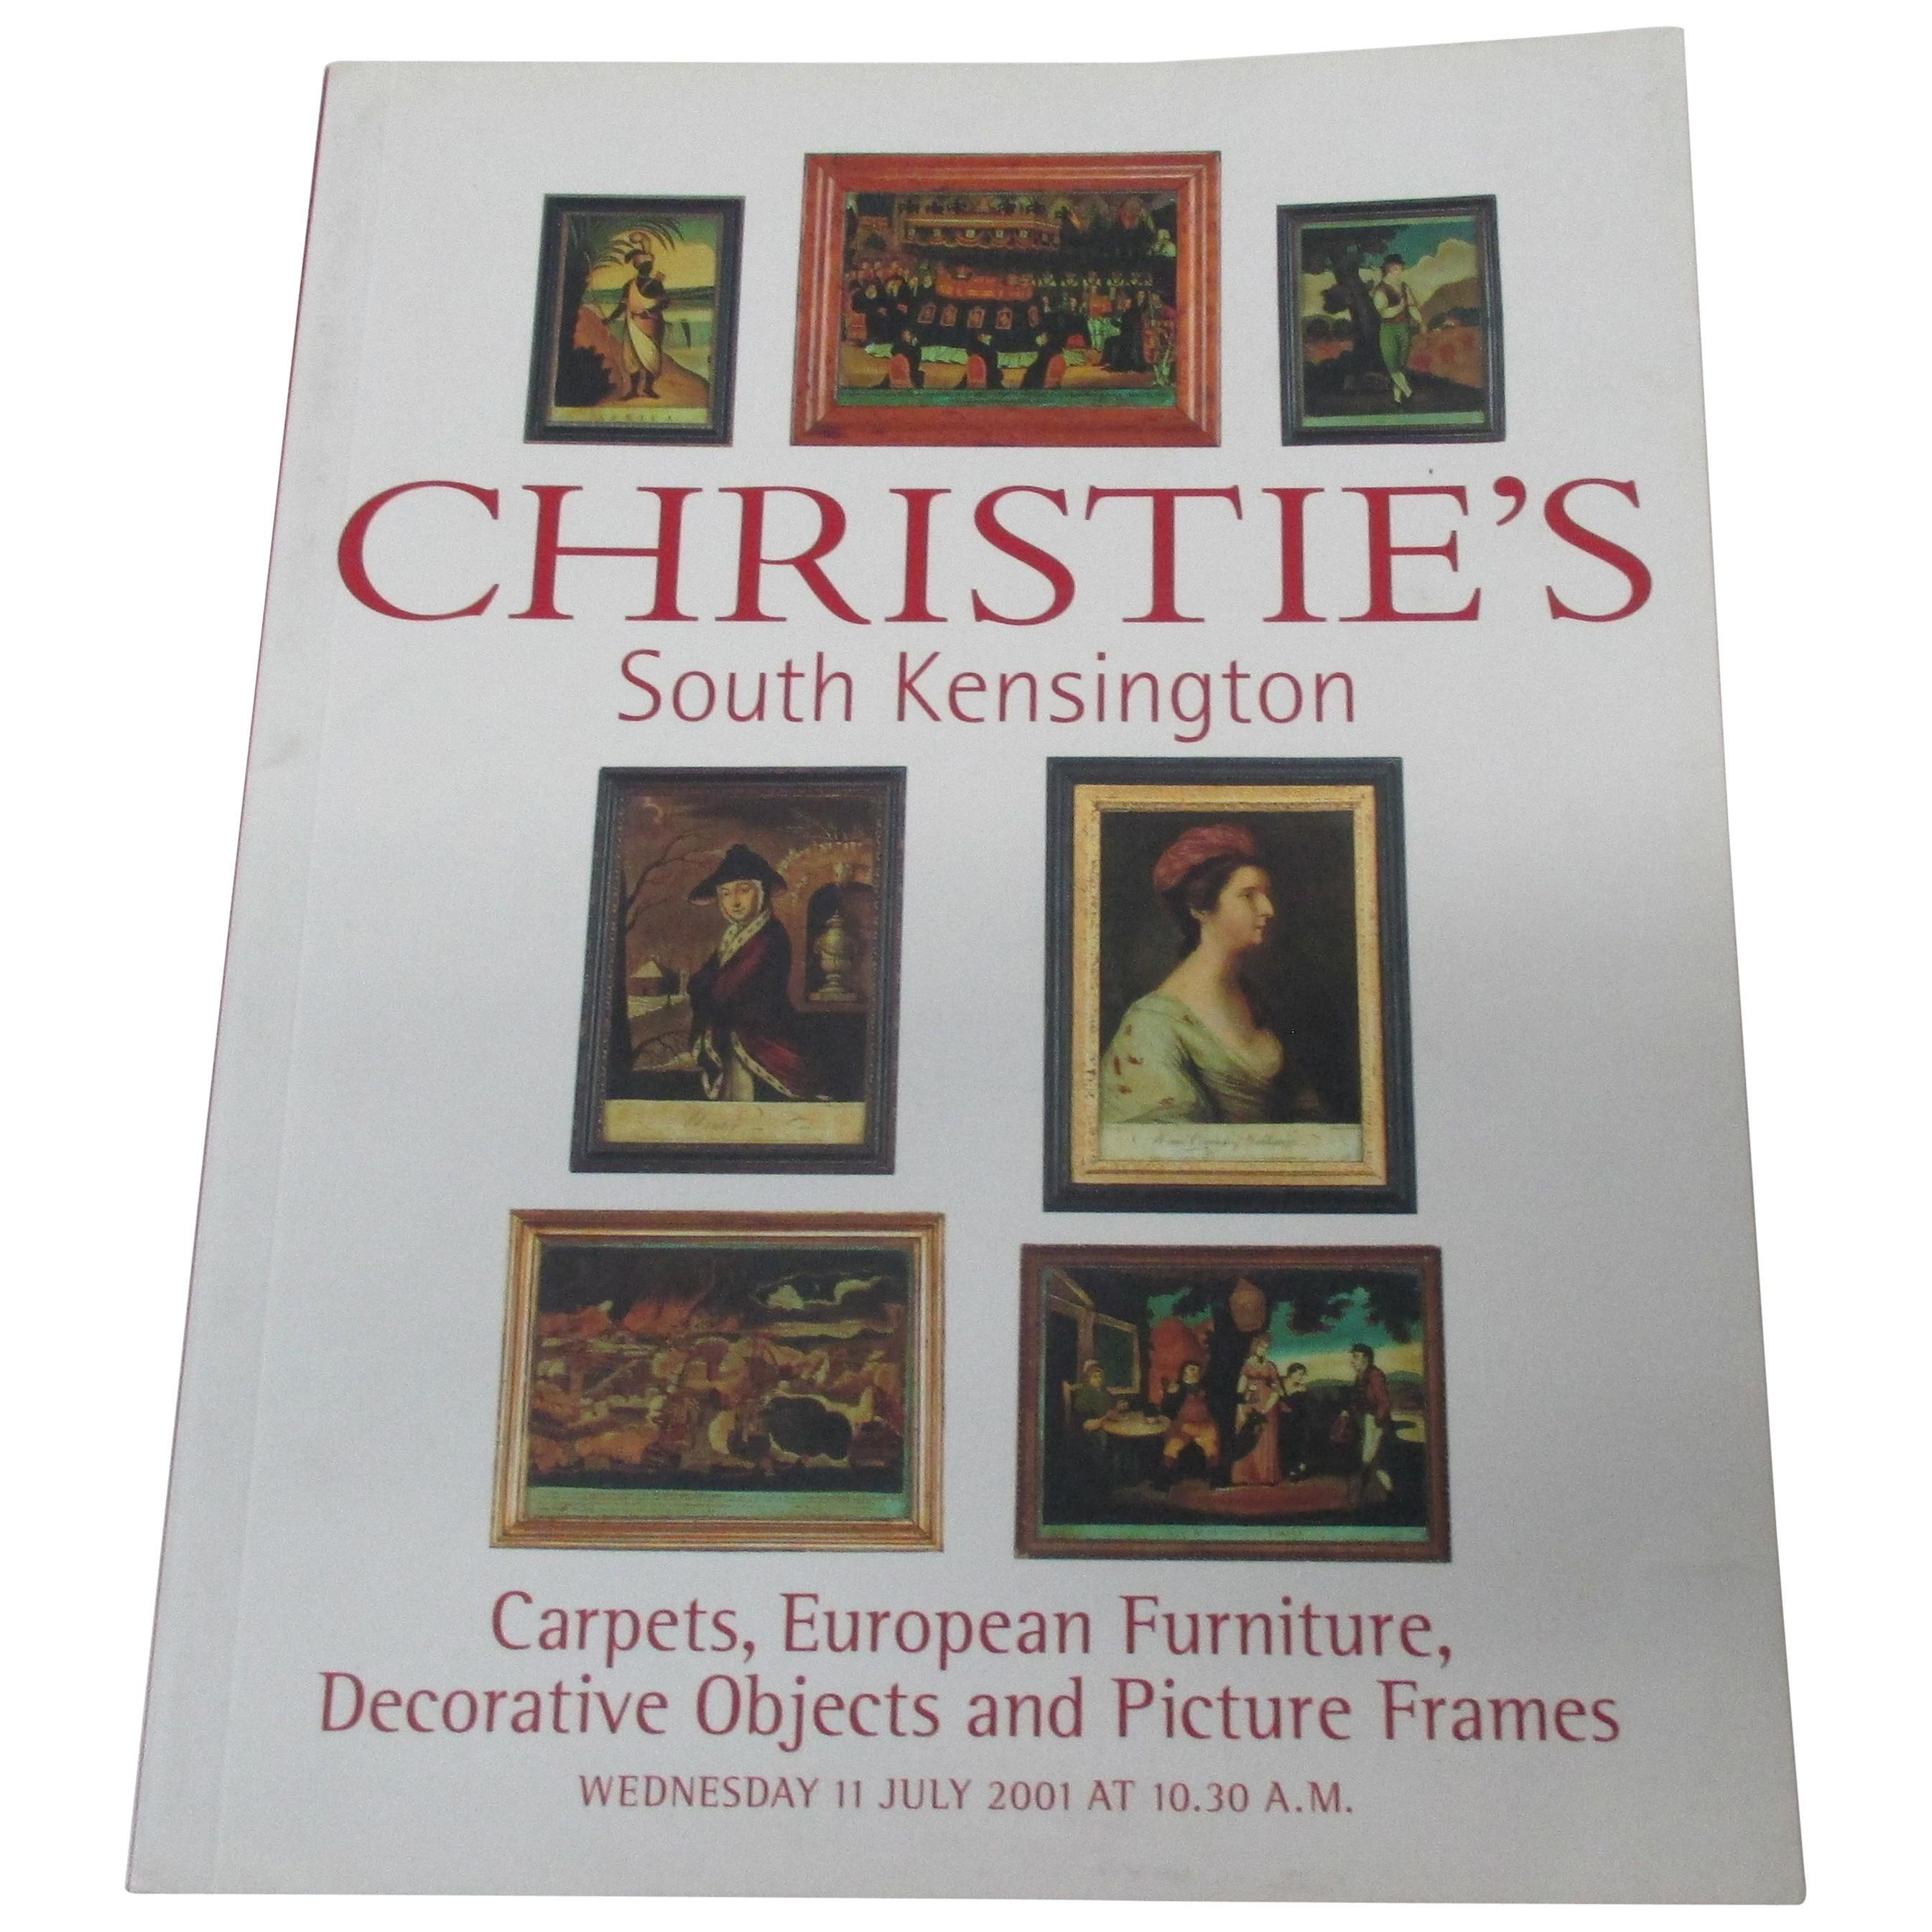 Christie's South Kensington Carpets, European Furniture, Decorative Objects